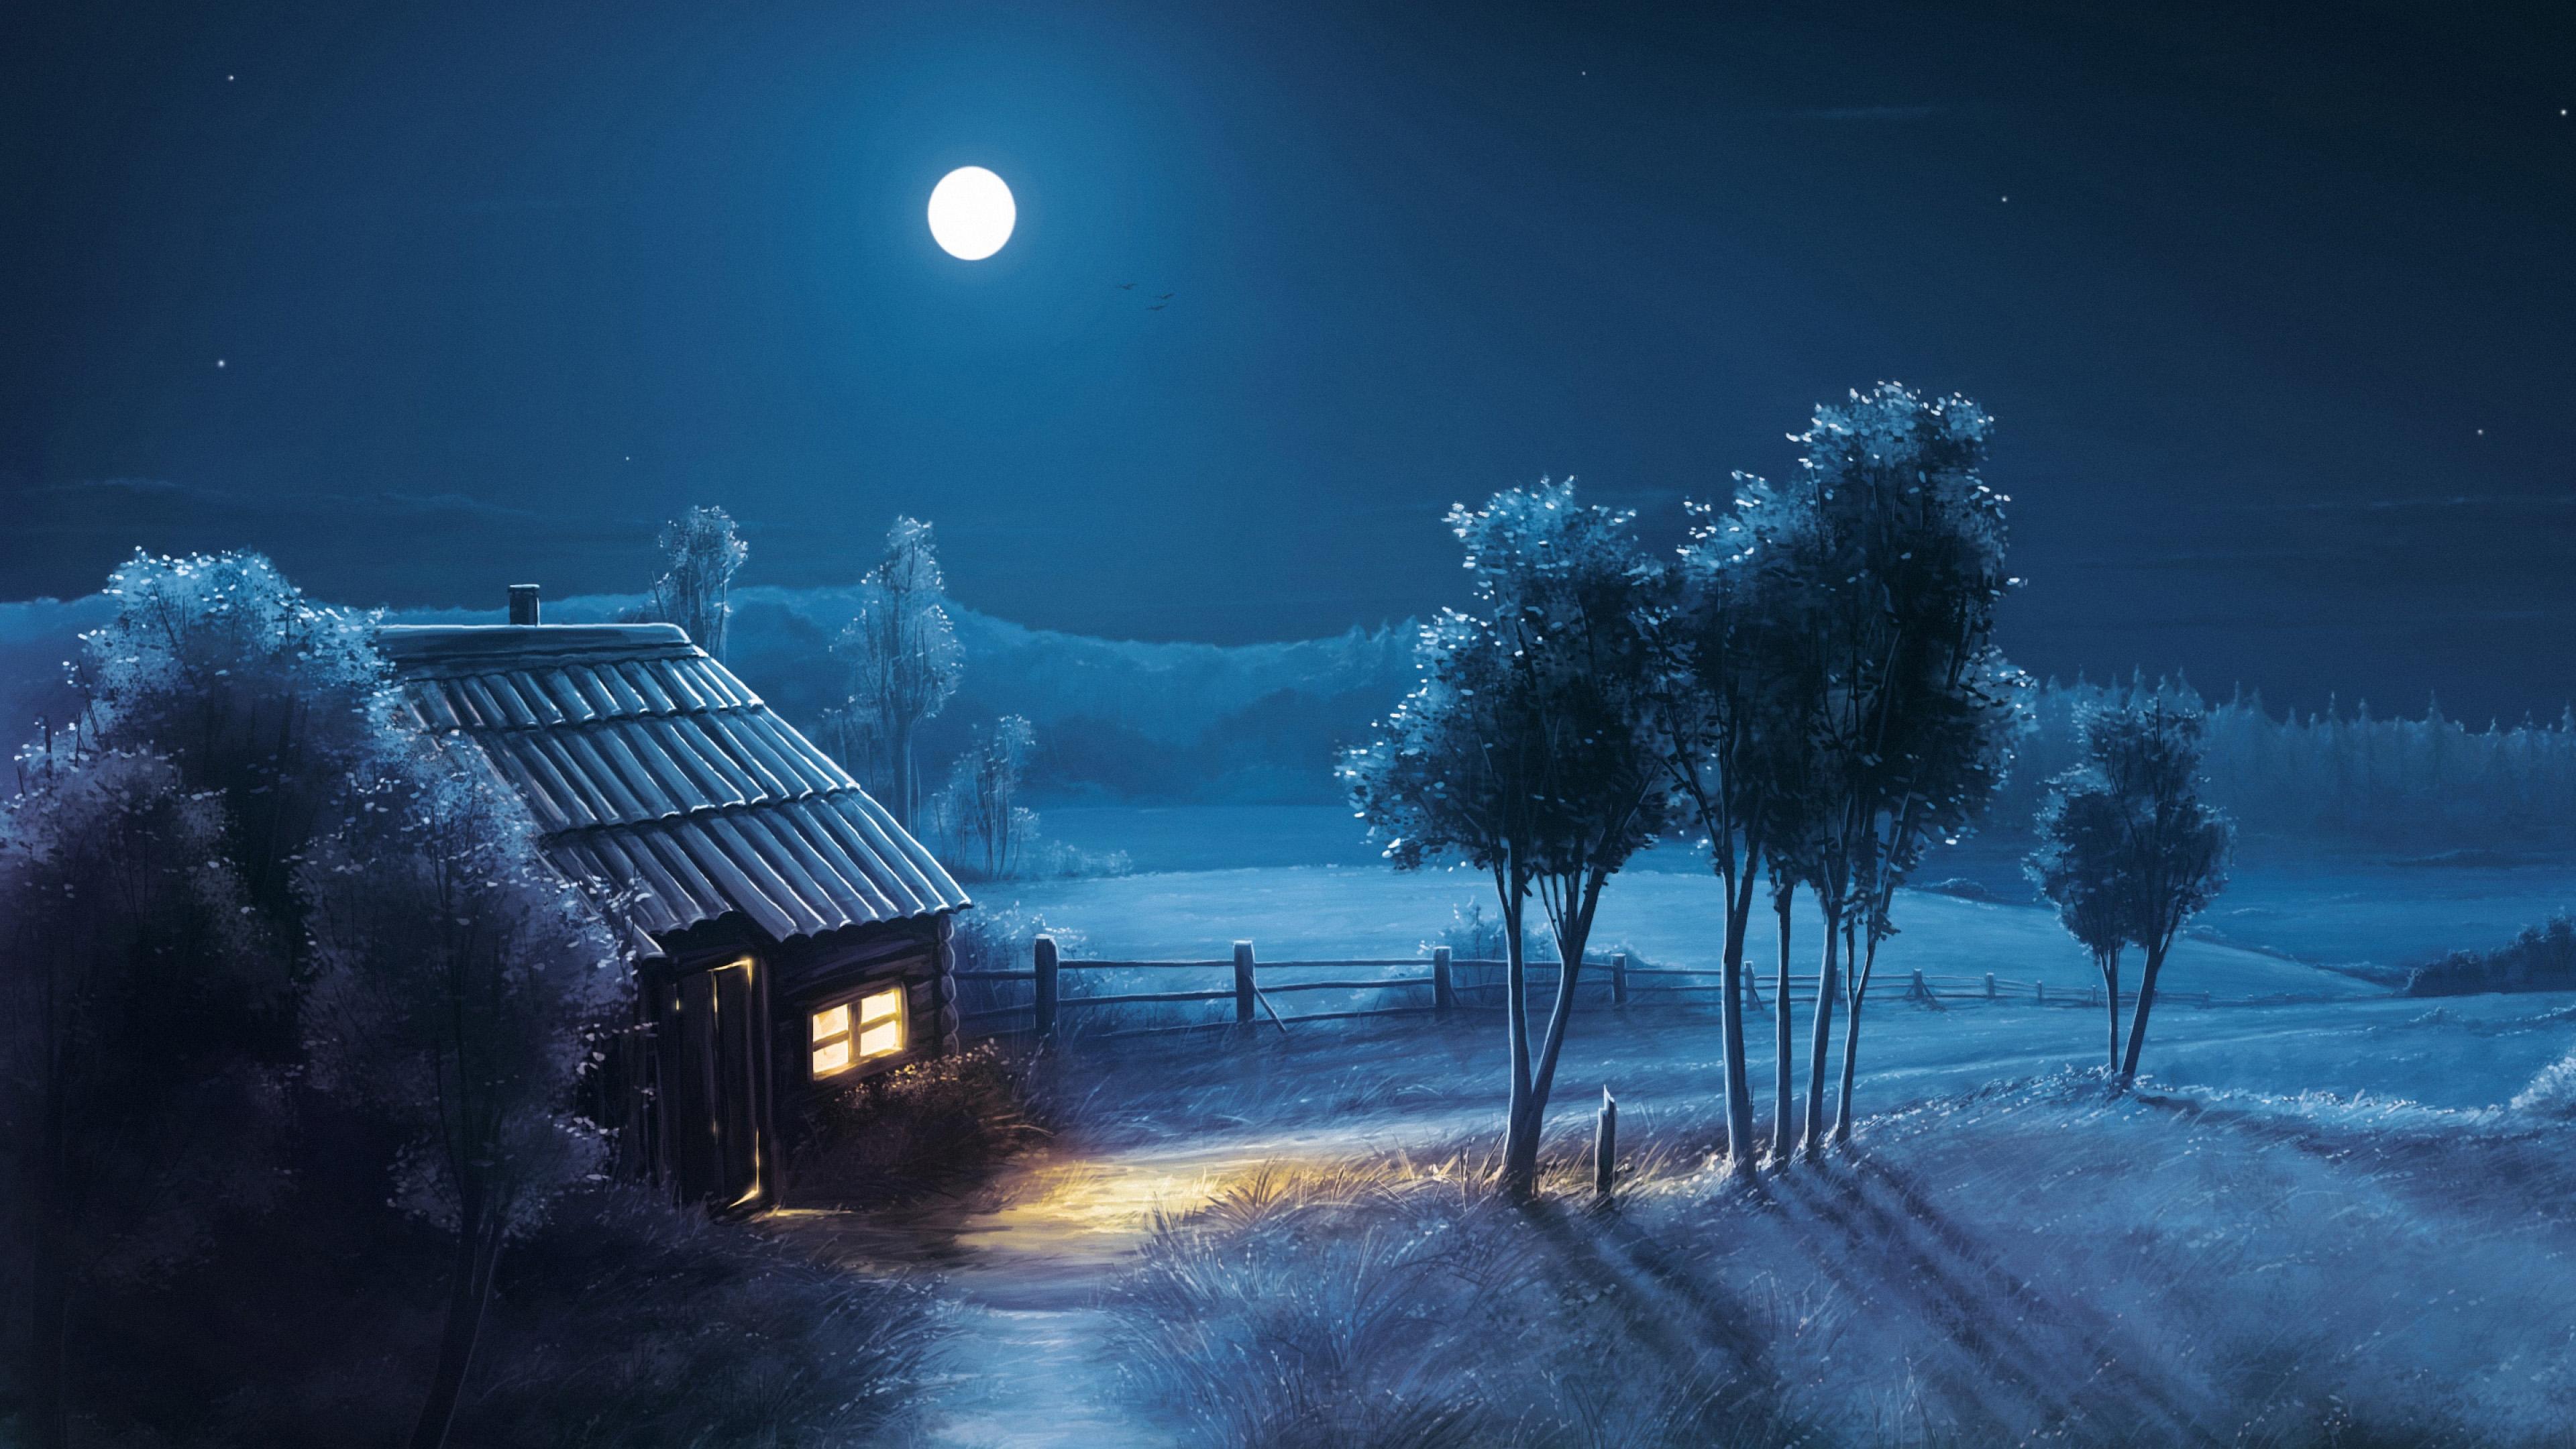 Art Moon Blue Night Trees House 4k Wallpaper Best Wallpapers